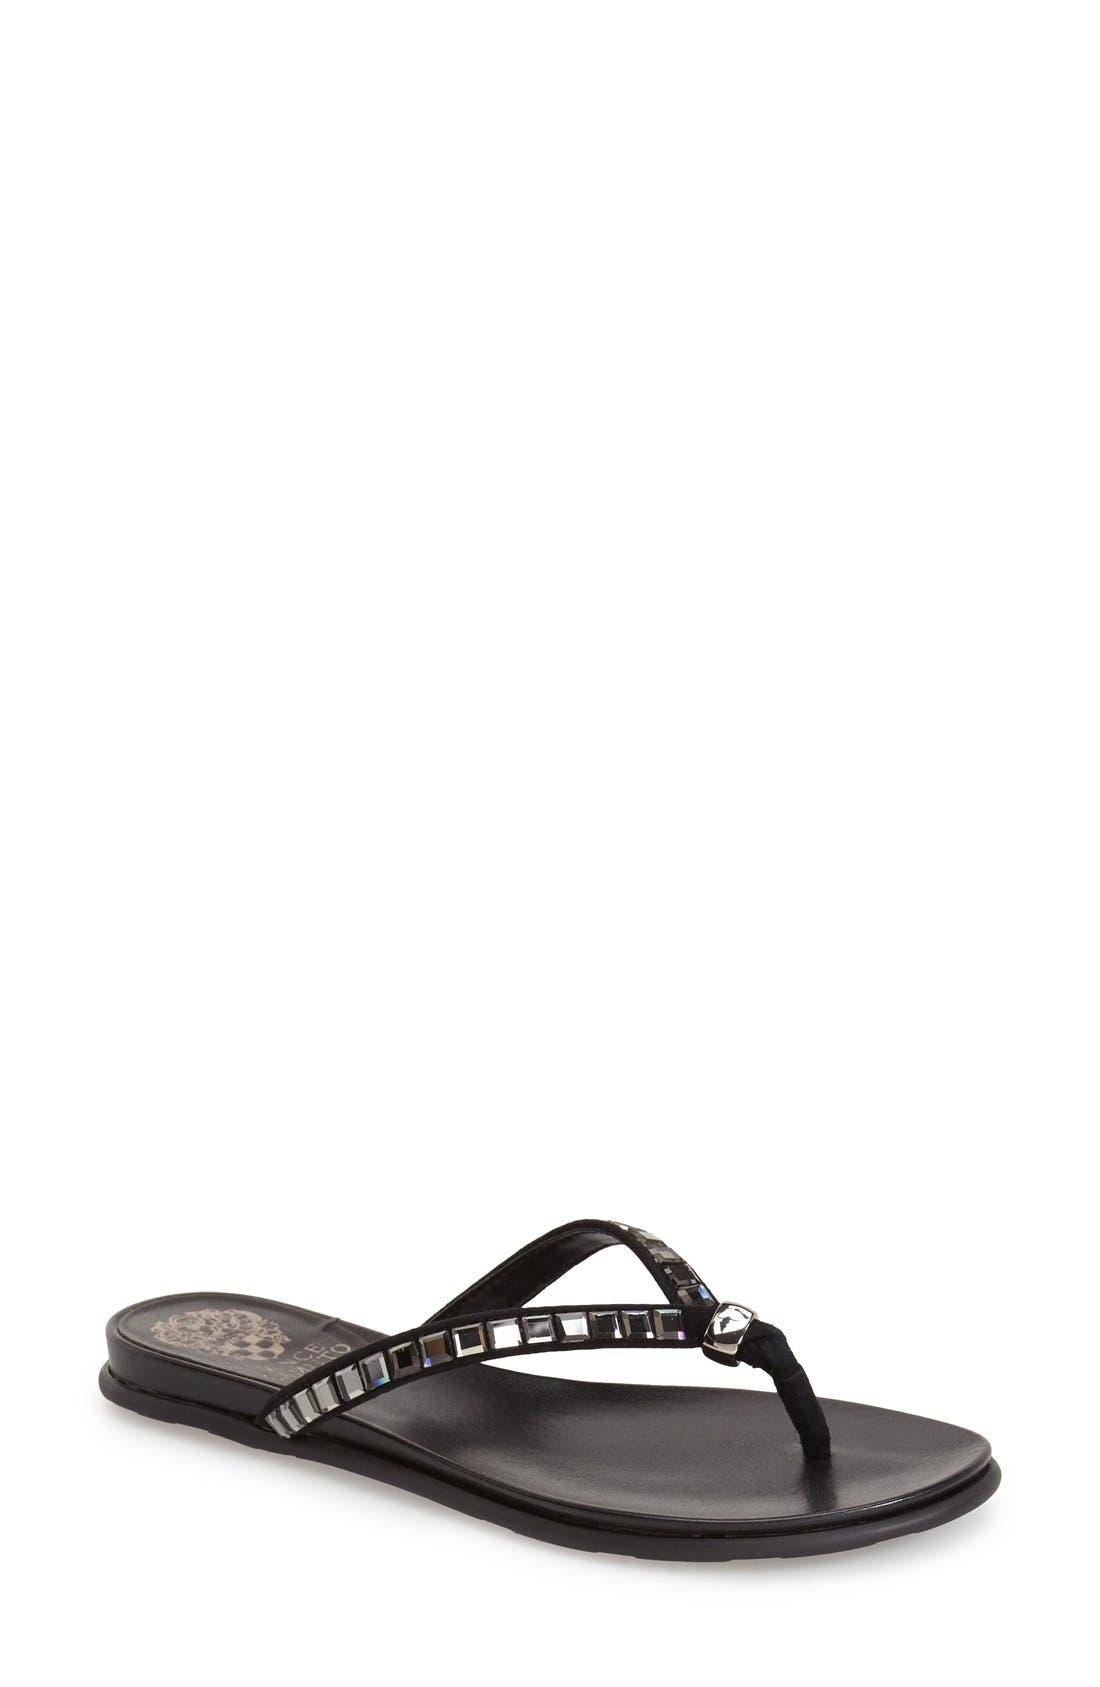 'Ellita' Flat Sandal,                             Main thumbnail 1, color,                             001